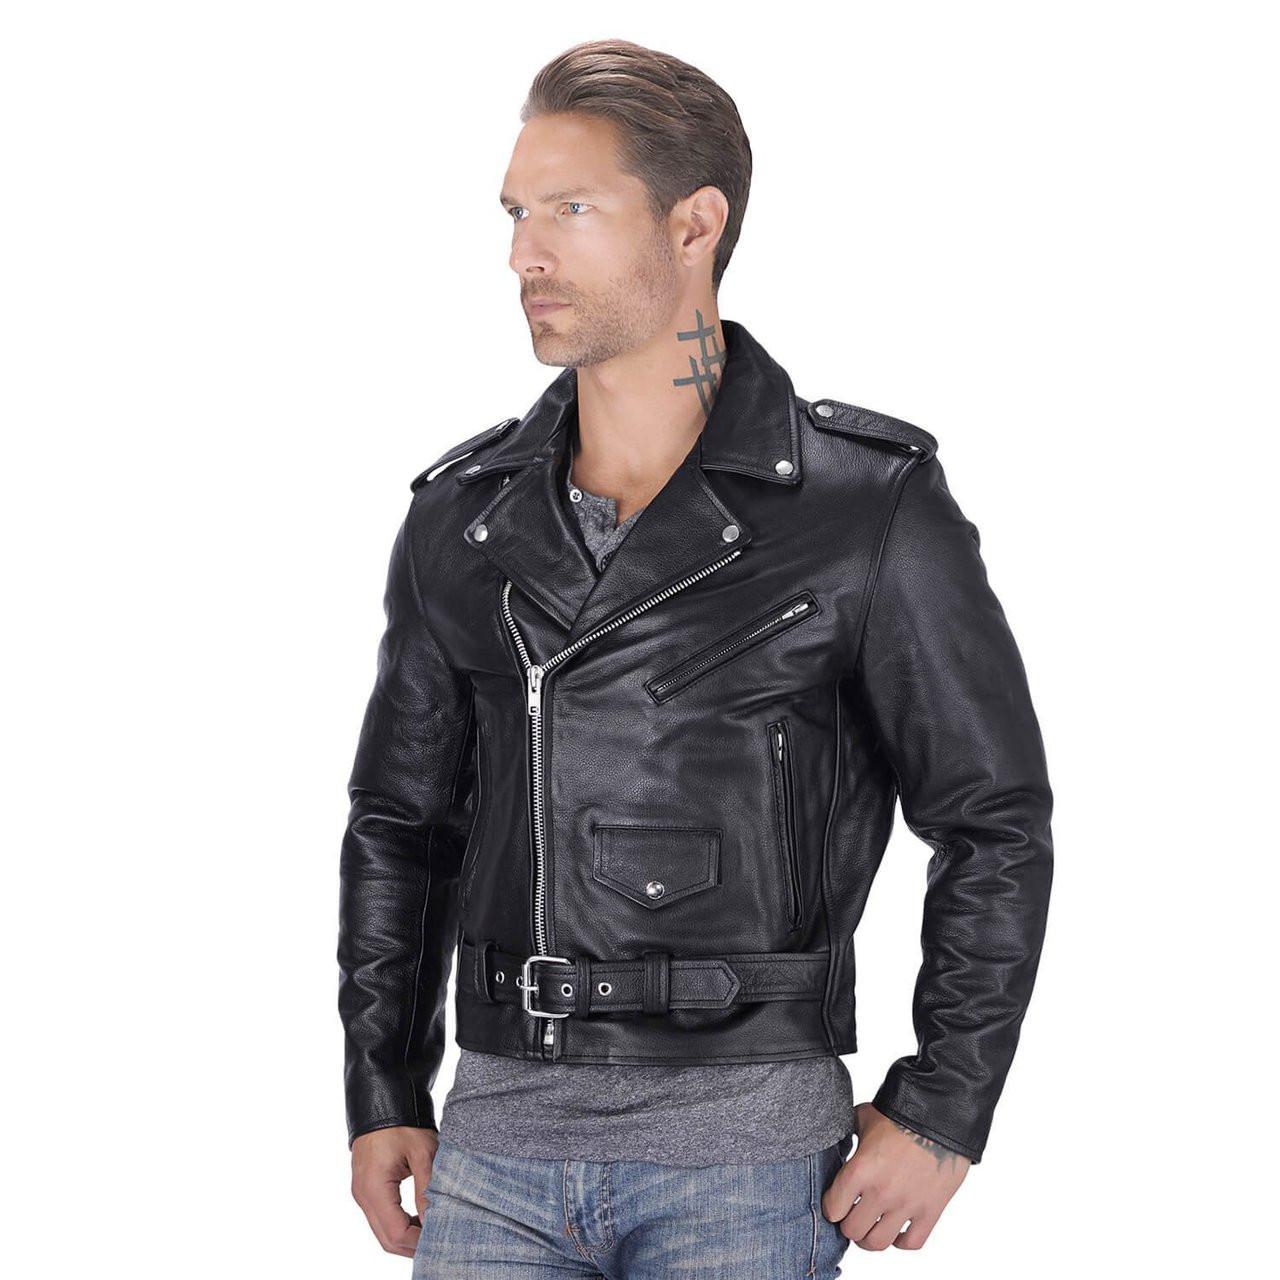 Motorcycle Biker Jacket